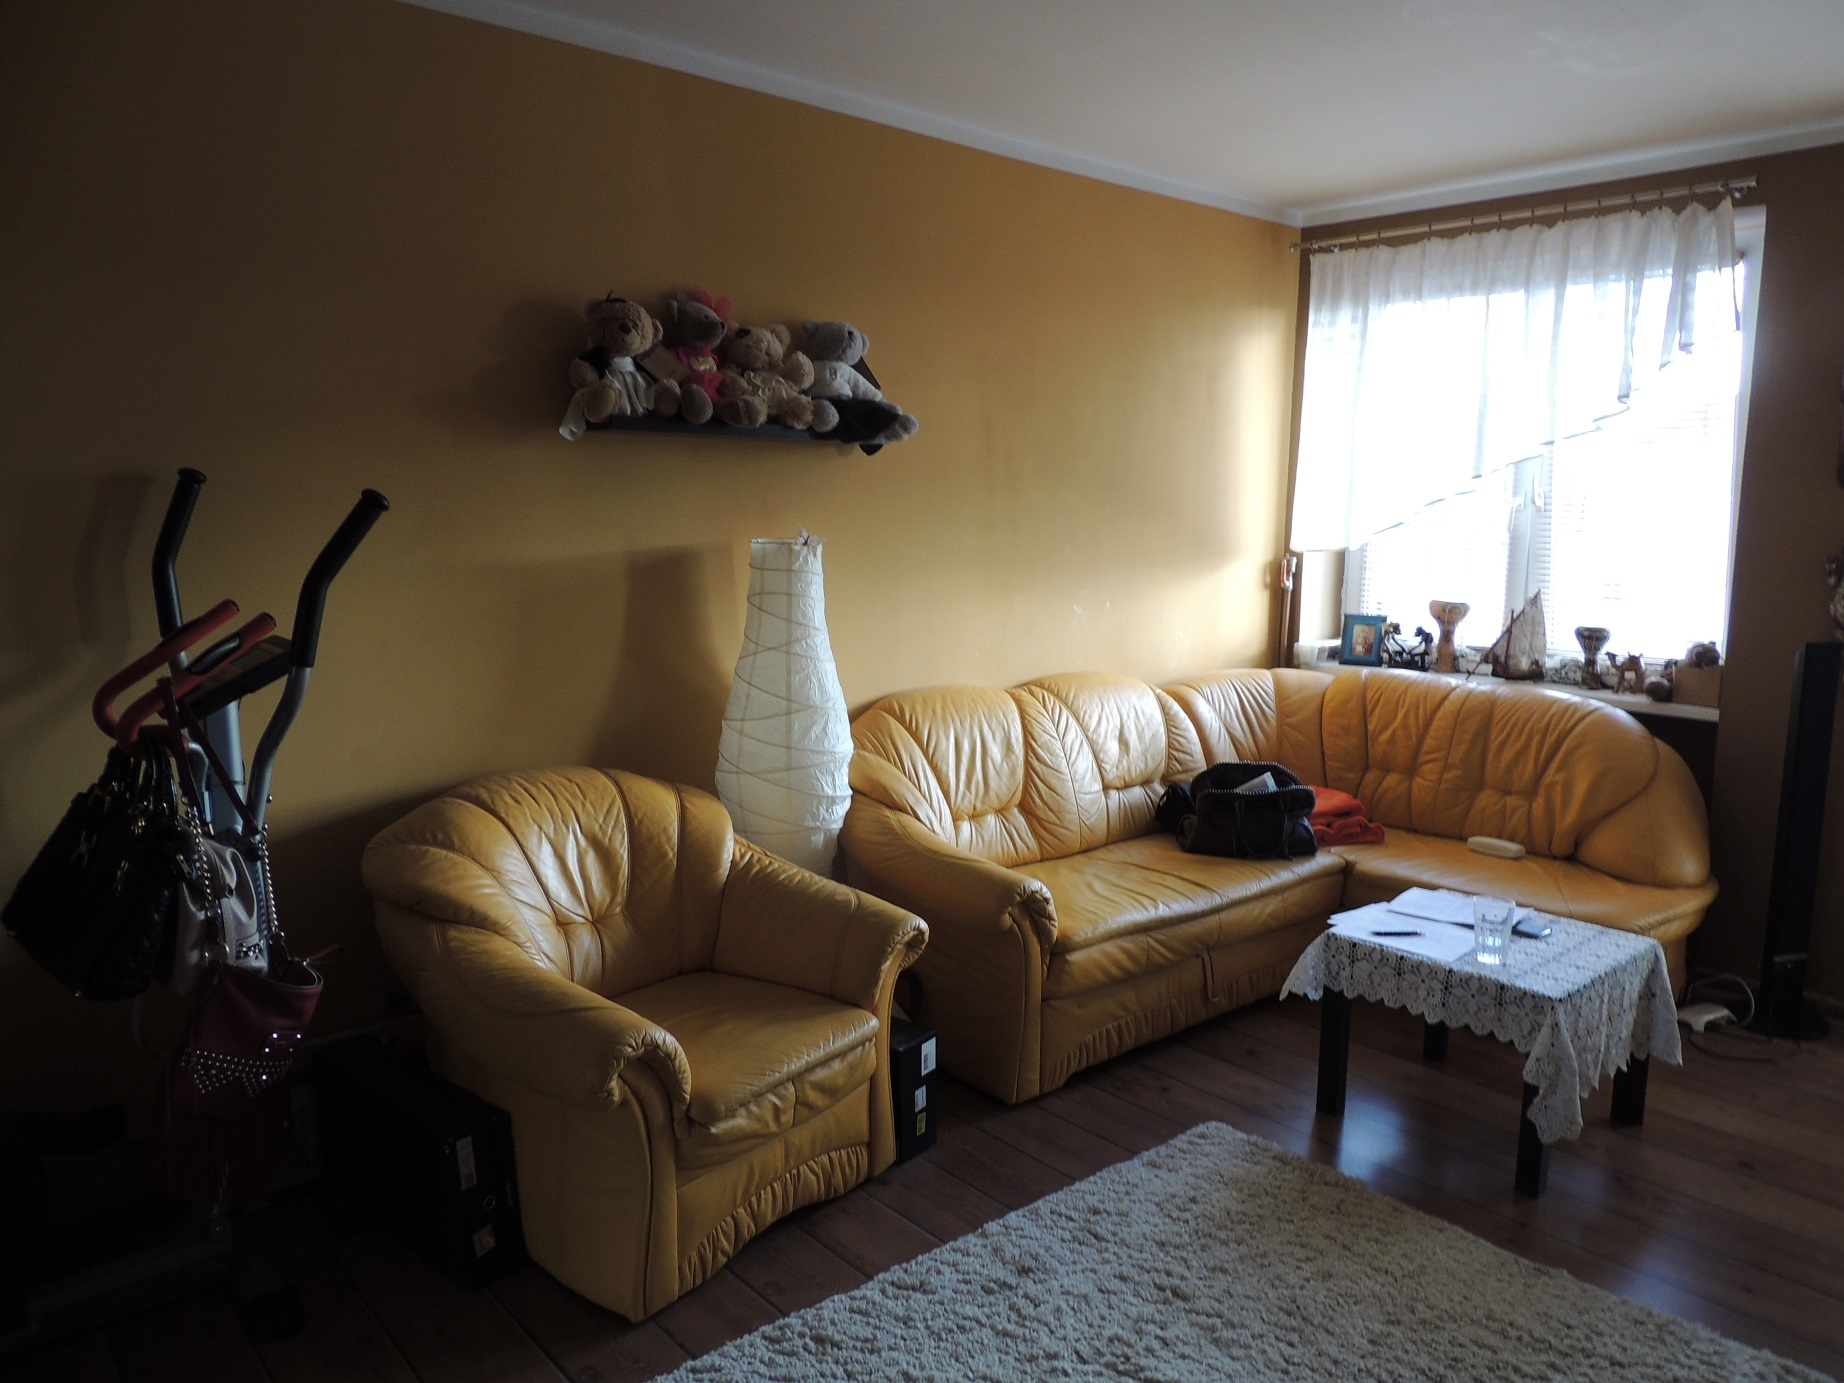 Mieszkanie 46,6 m2 w Ełku na os. Jeziorna